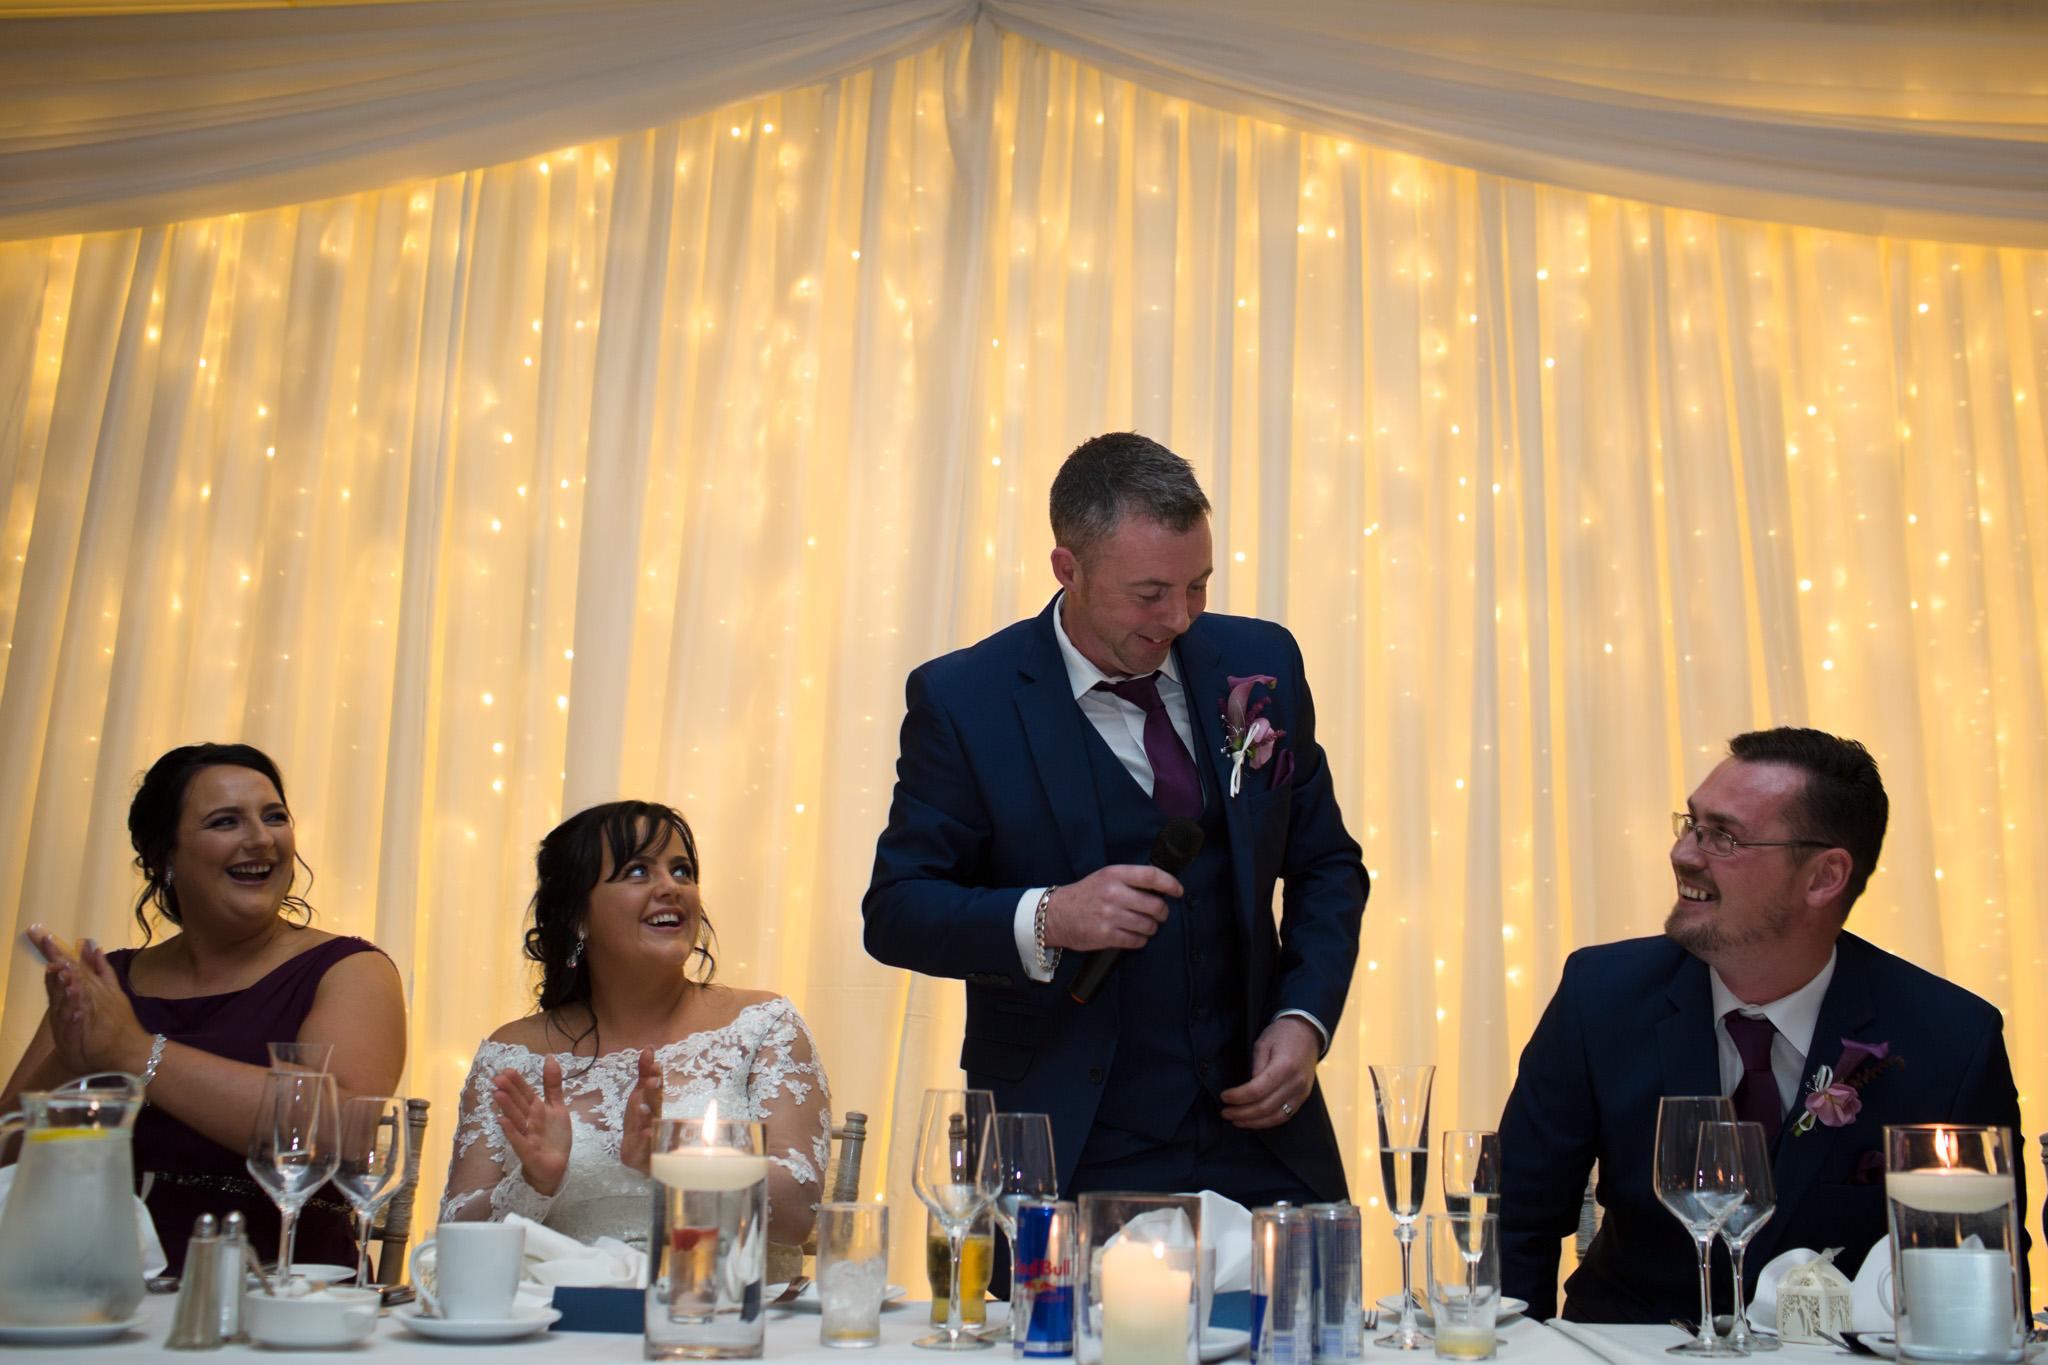 Mark_Barnes_Northern_Ireland_Wedding_Photography_Marine_hotel_ballycastle_Wedding_Photography_Janet&Darren-35.jpg